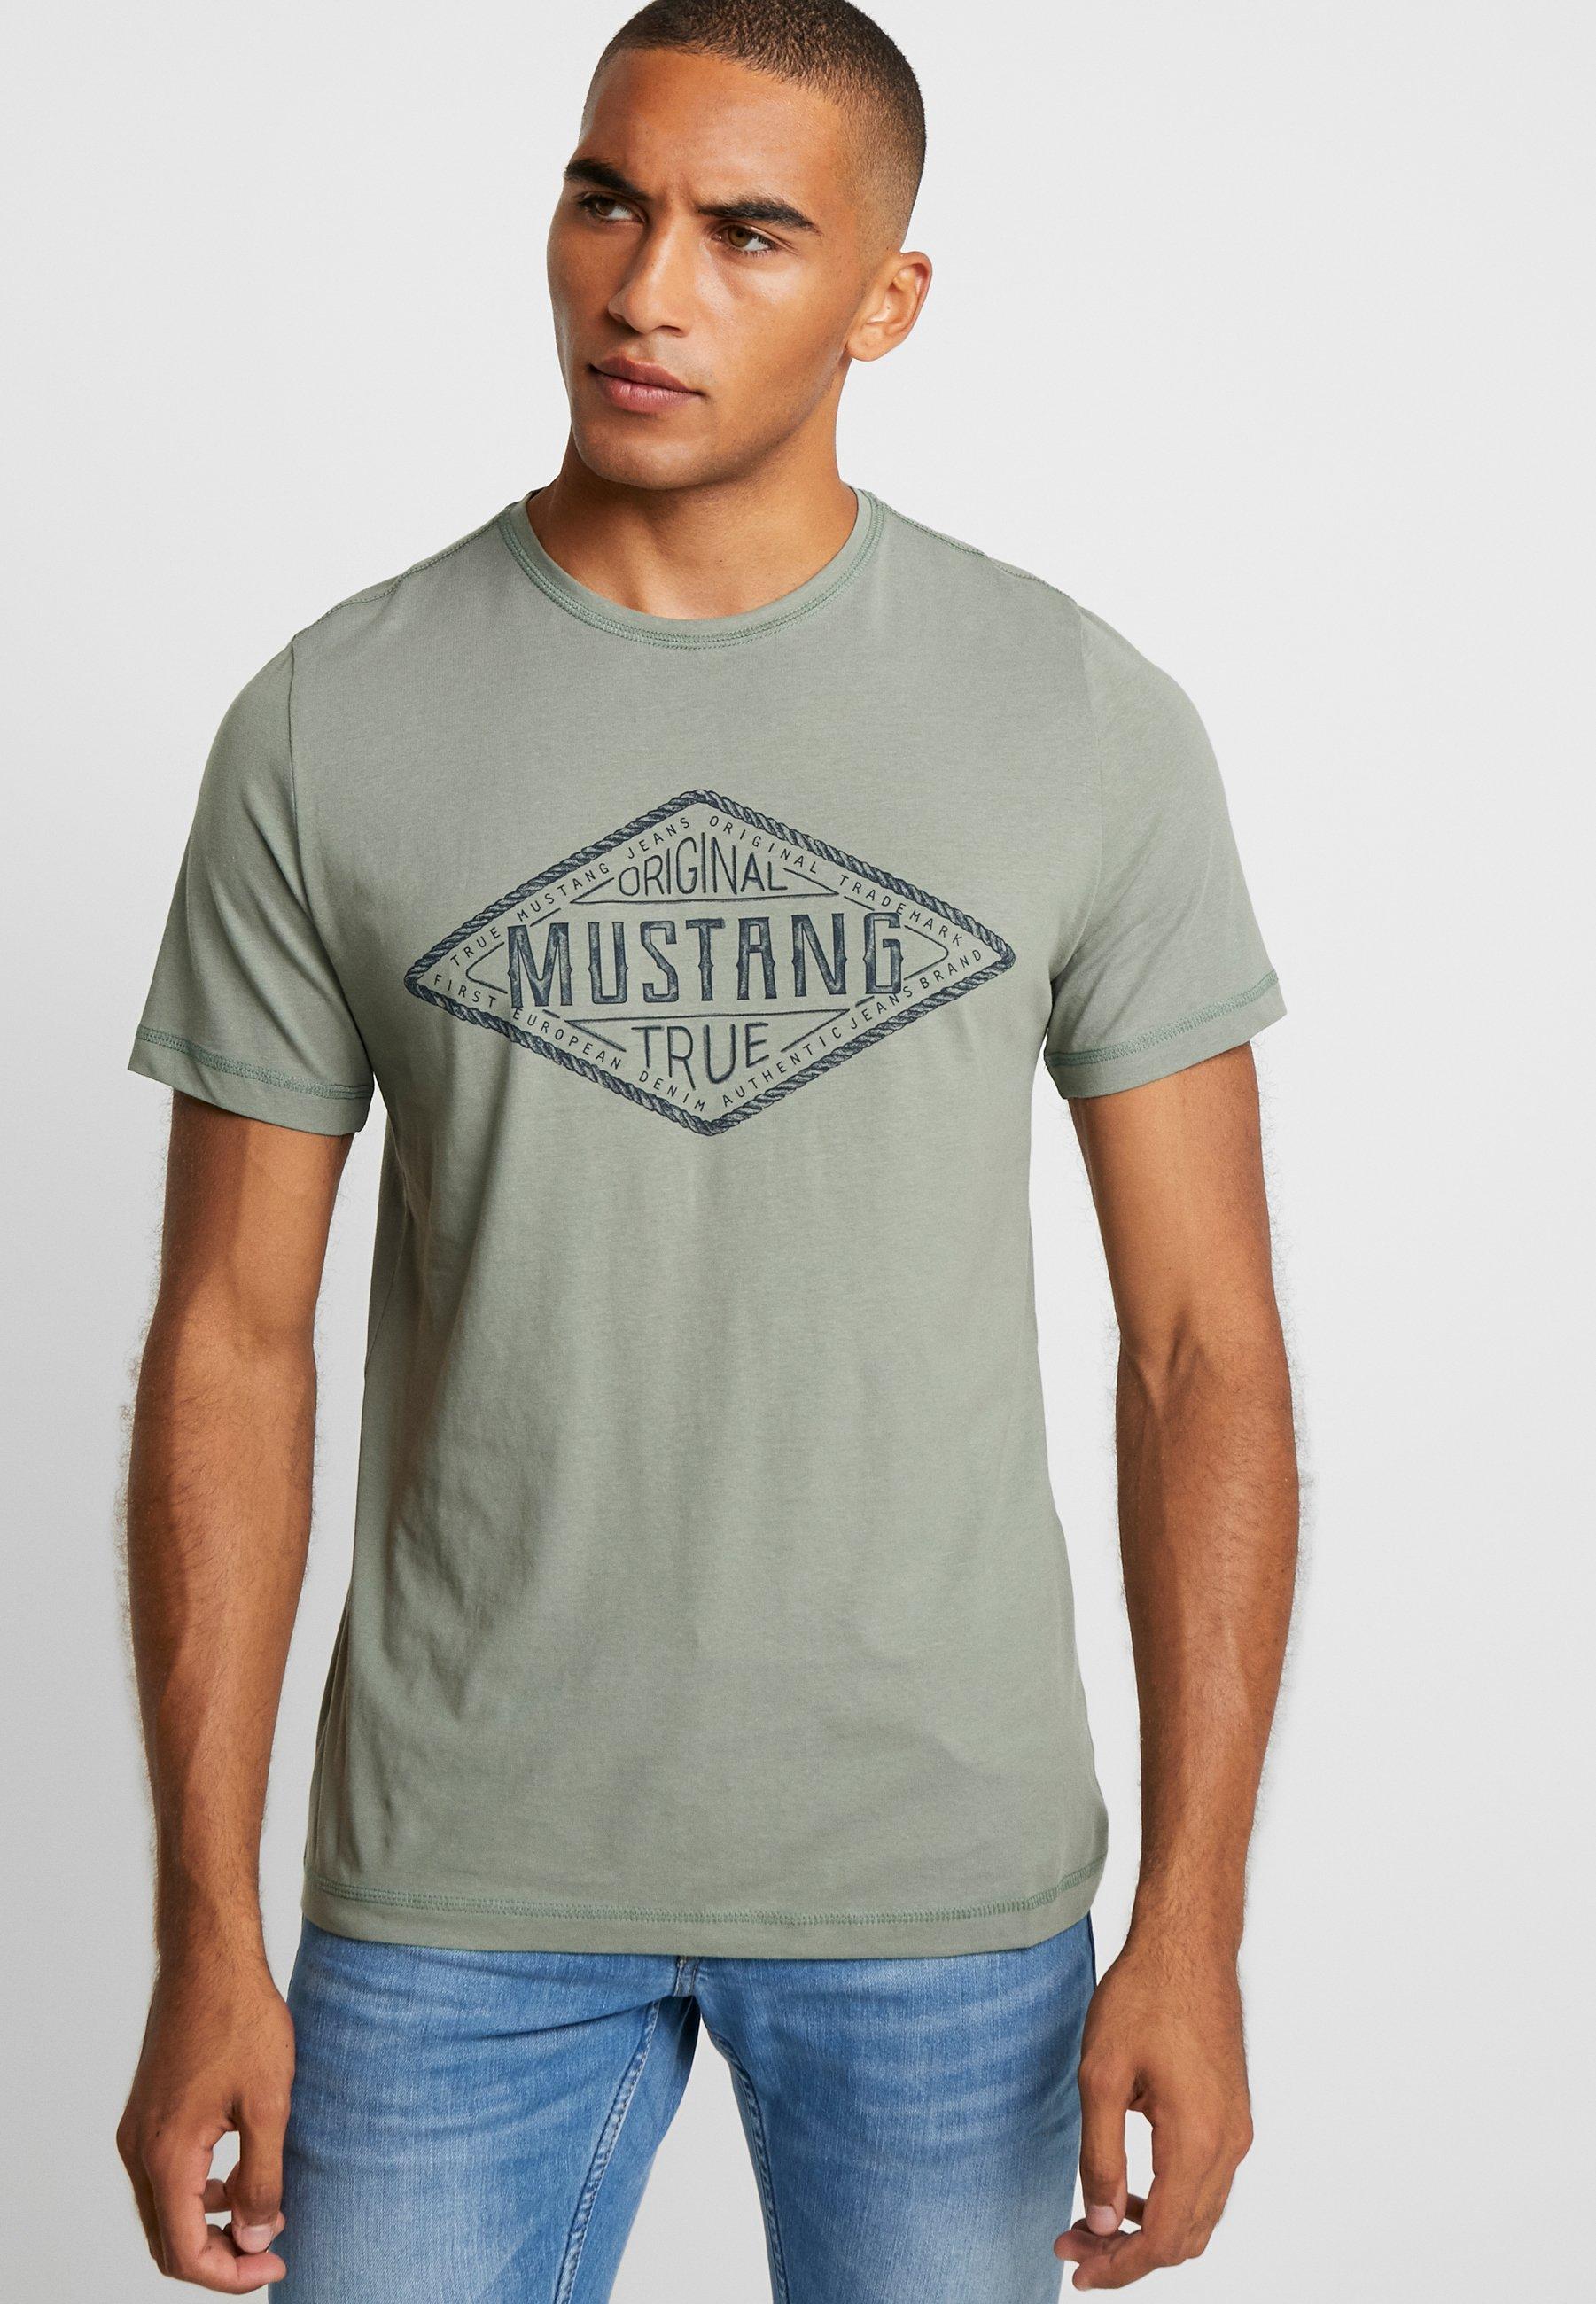 AlexT Sea shirt Imprimé Mustang Spray oedBrCxW